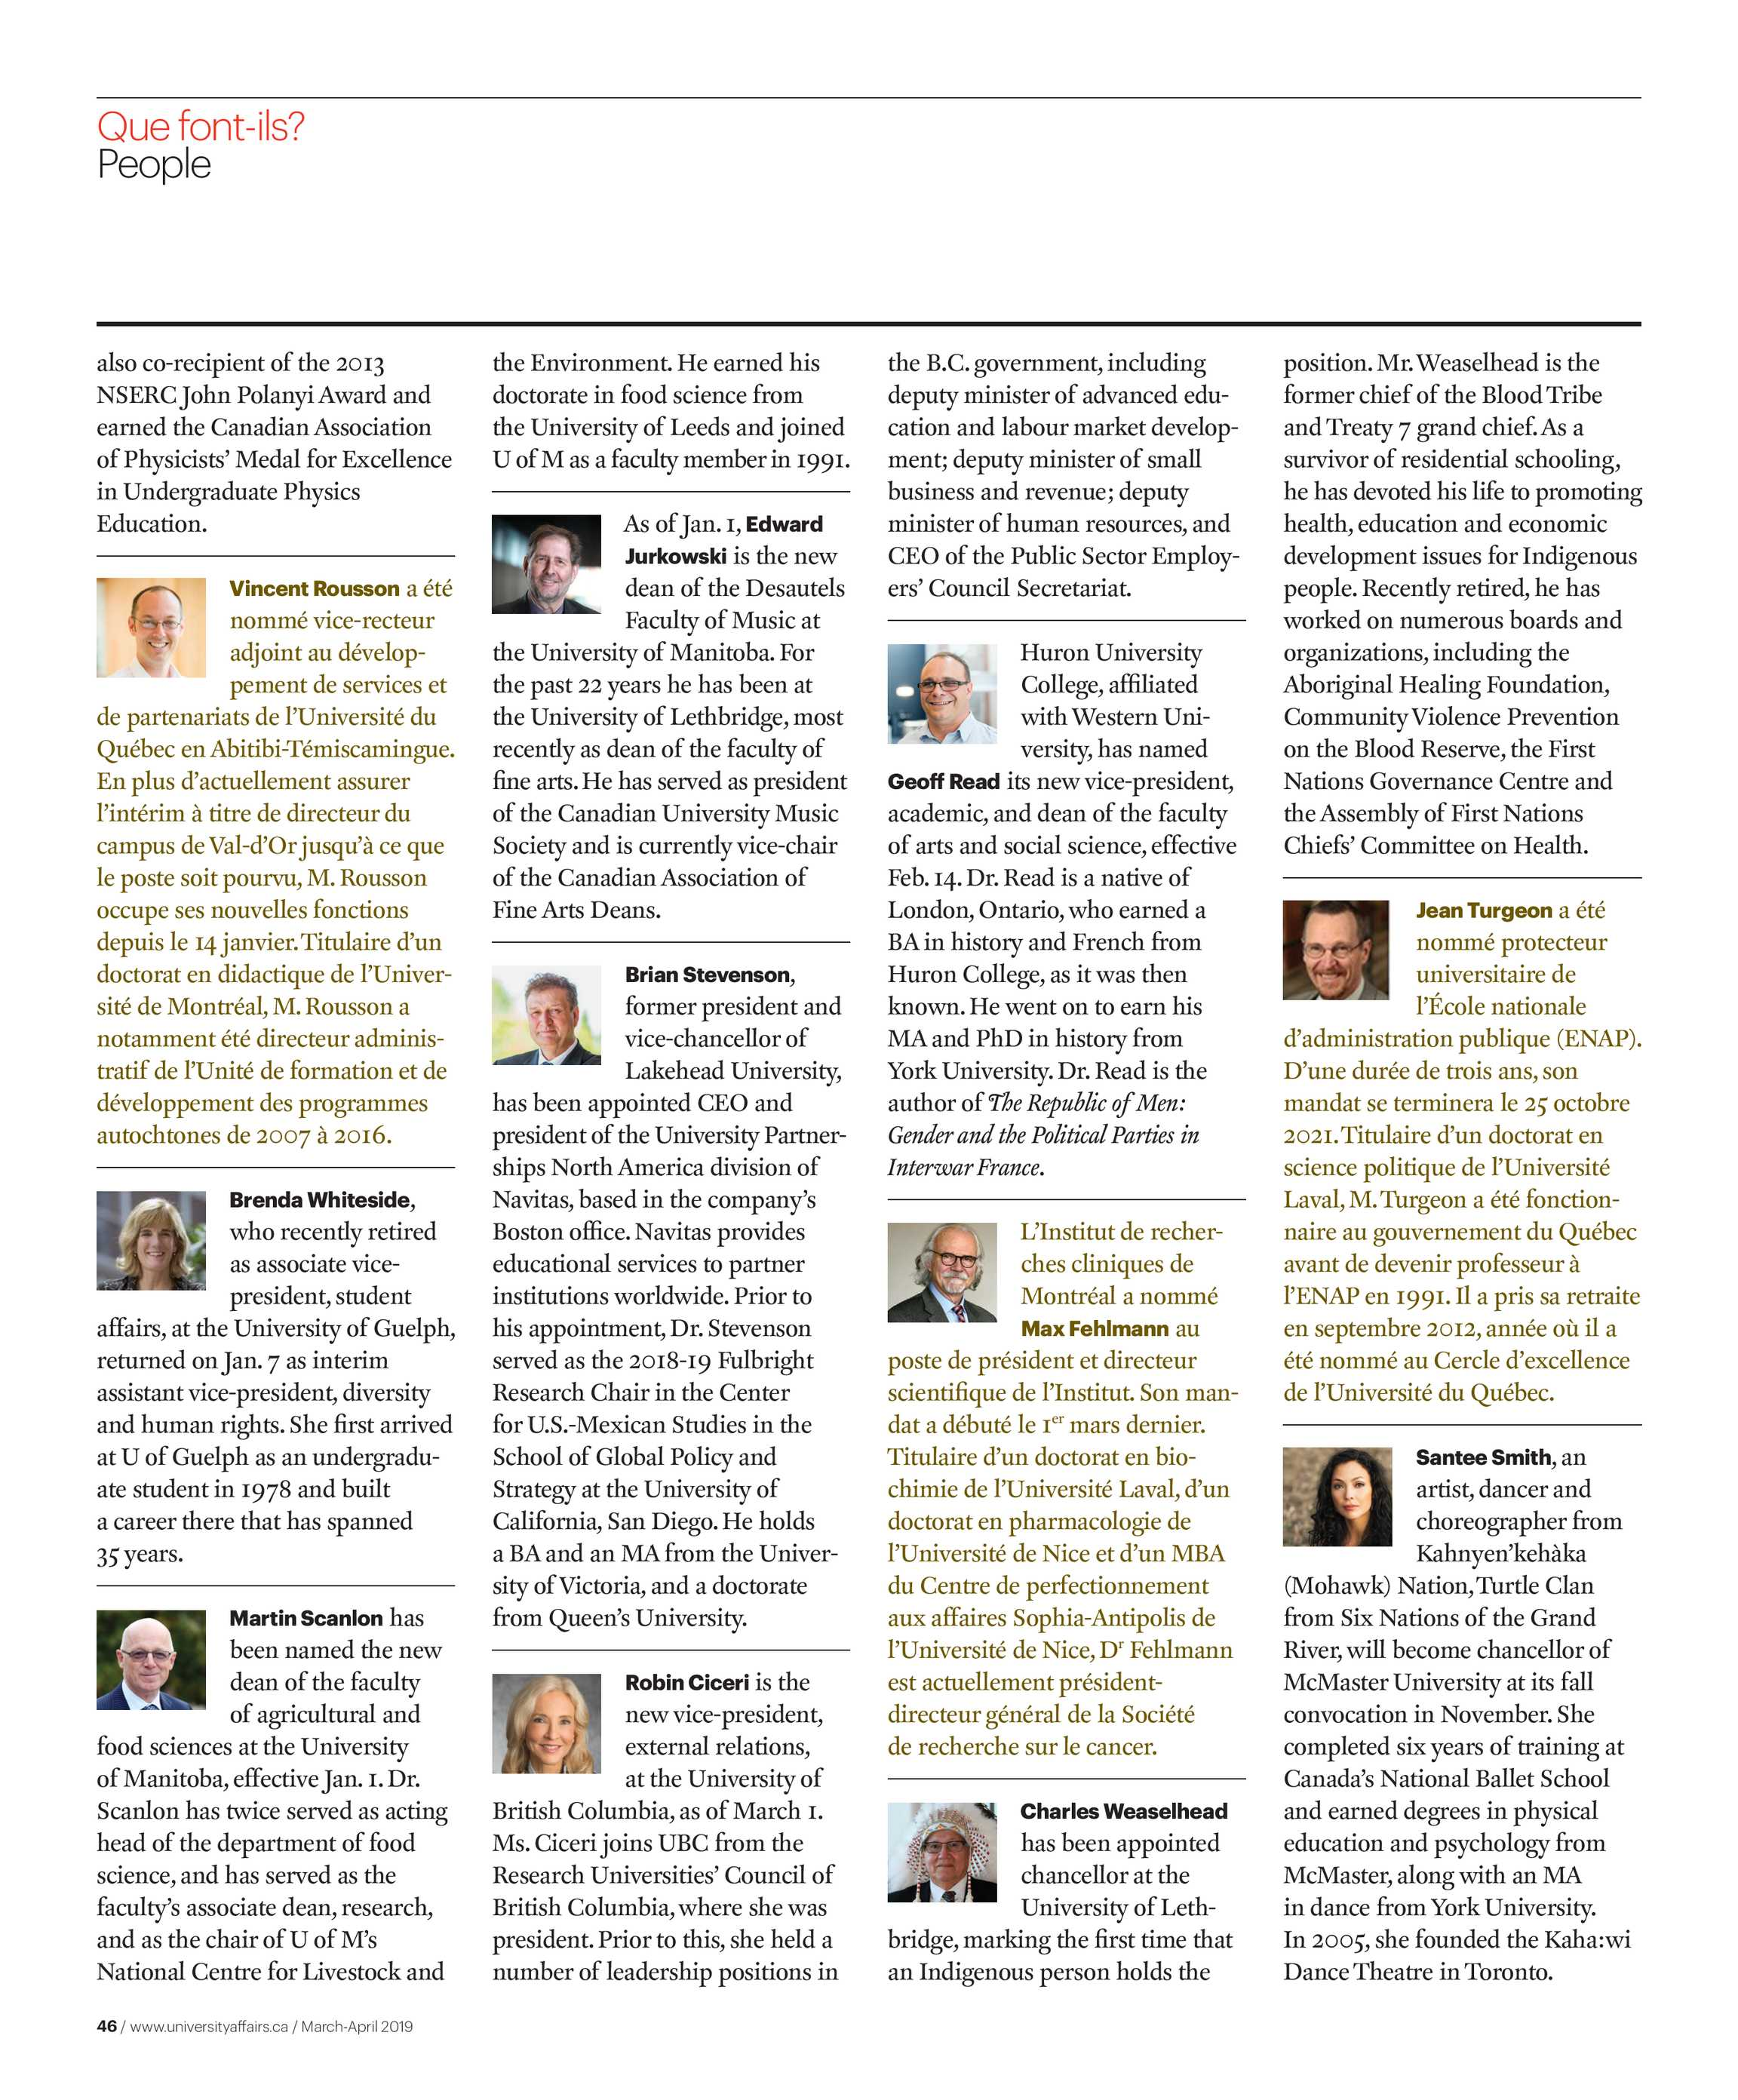 University Affairs - March-April 2019 - page 46